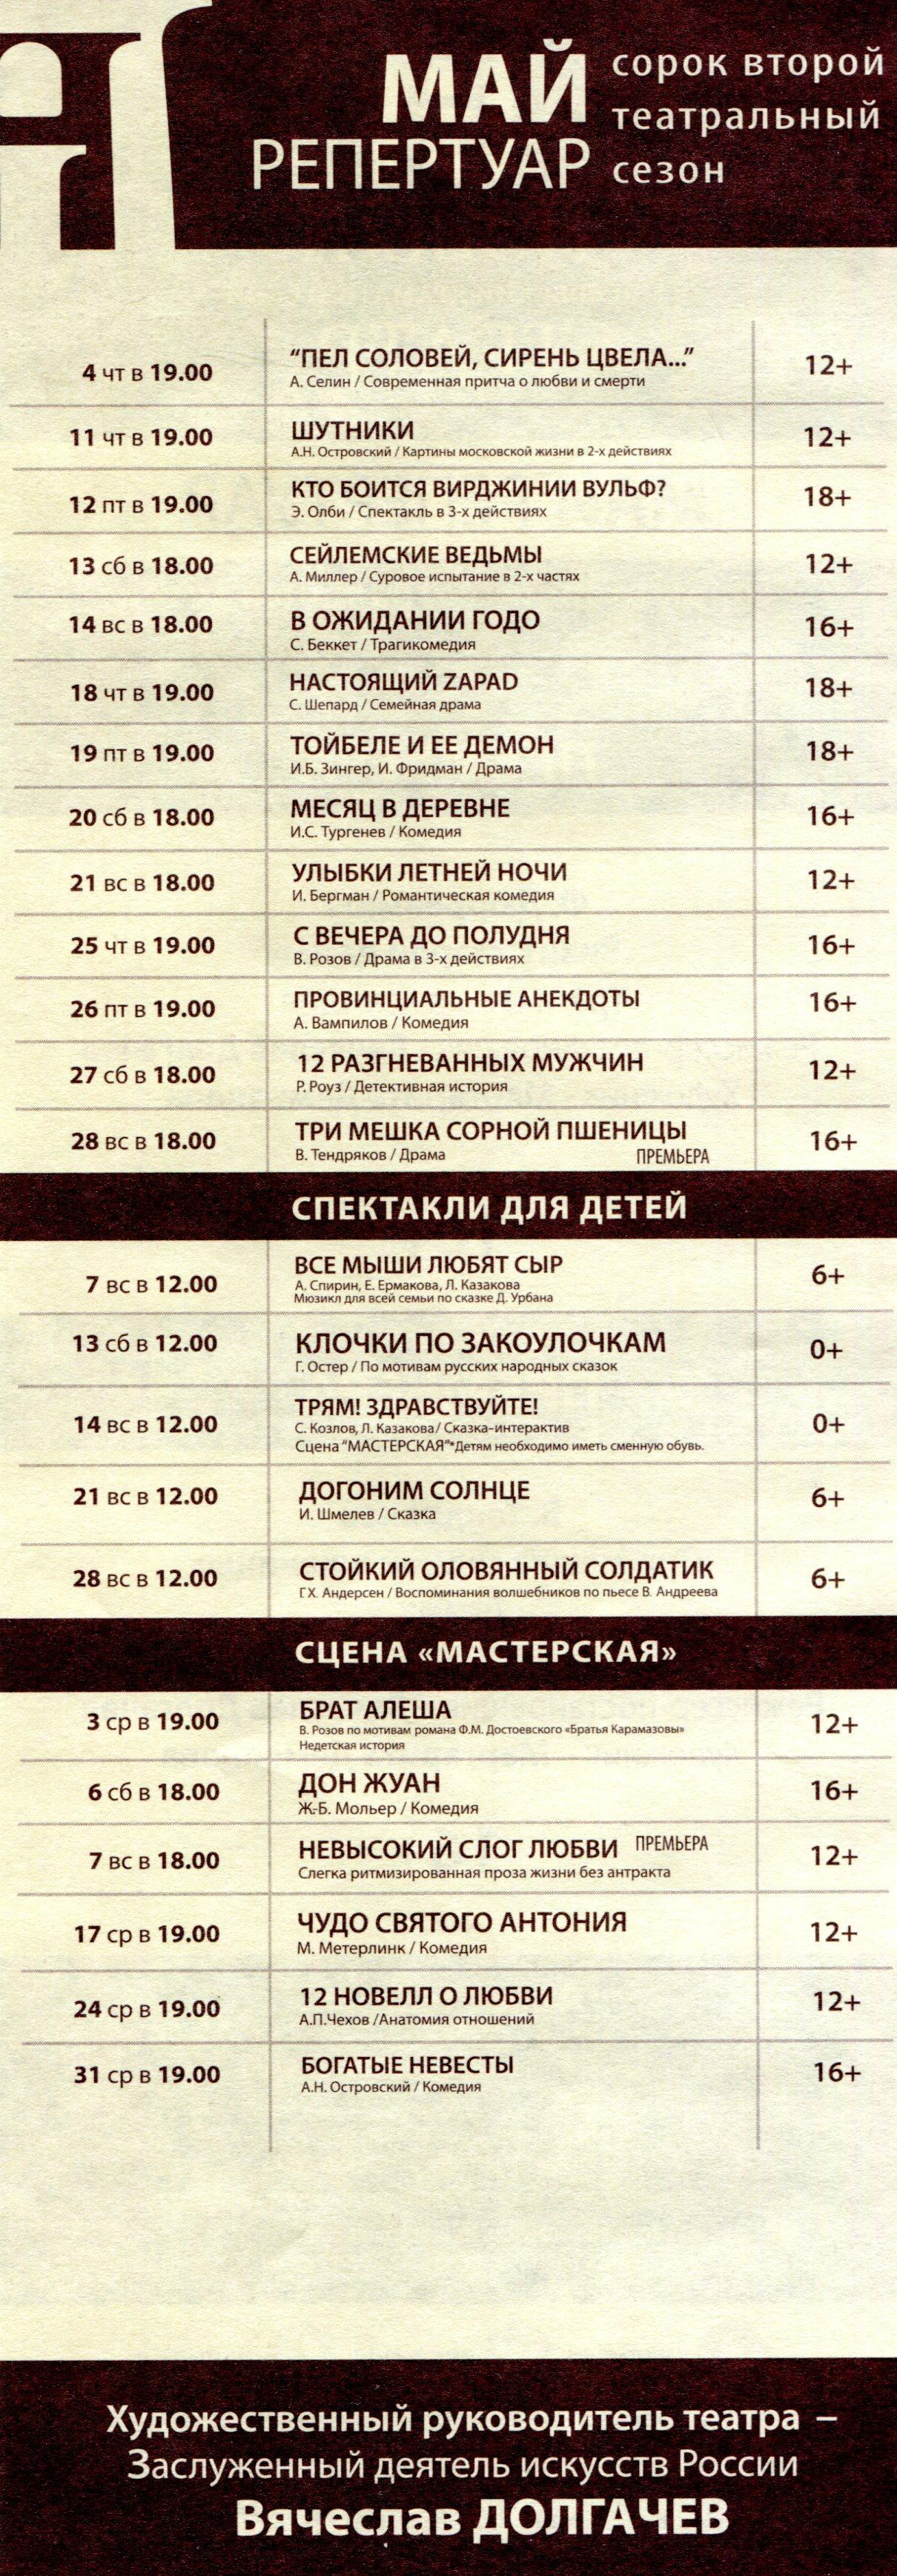 Репертуар Нового театра на май 2017-го года